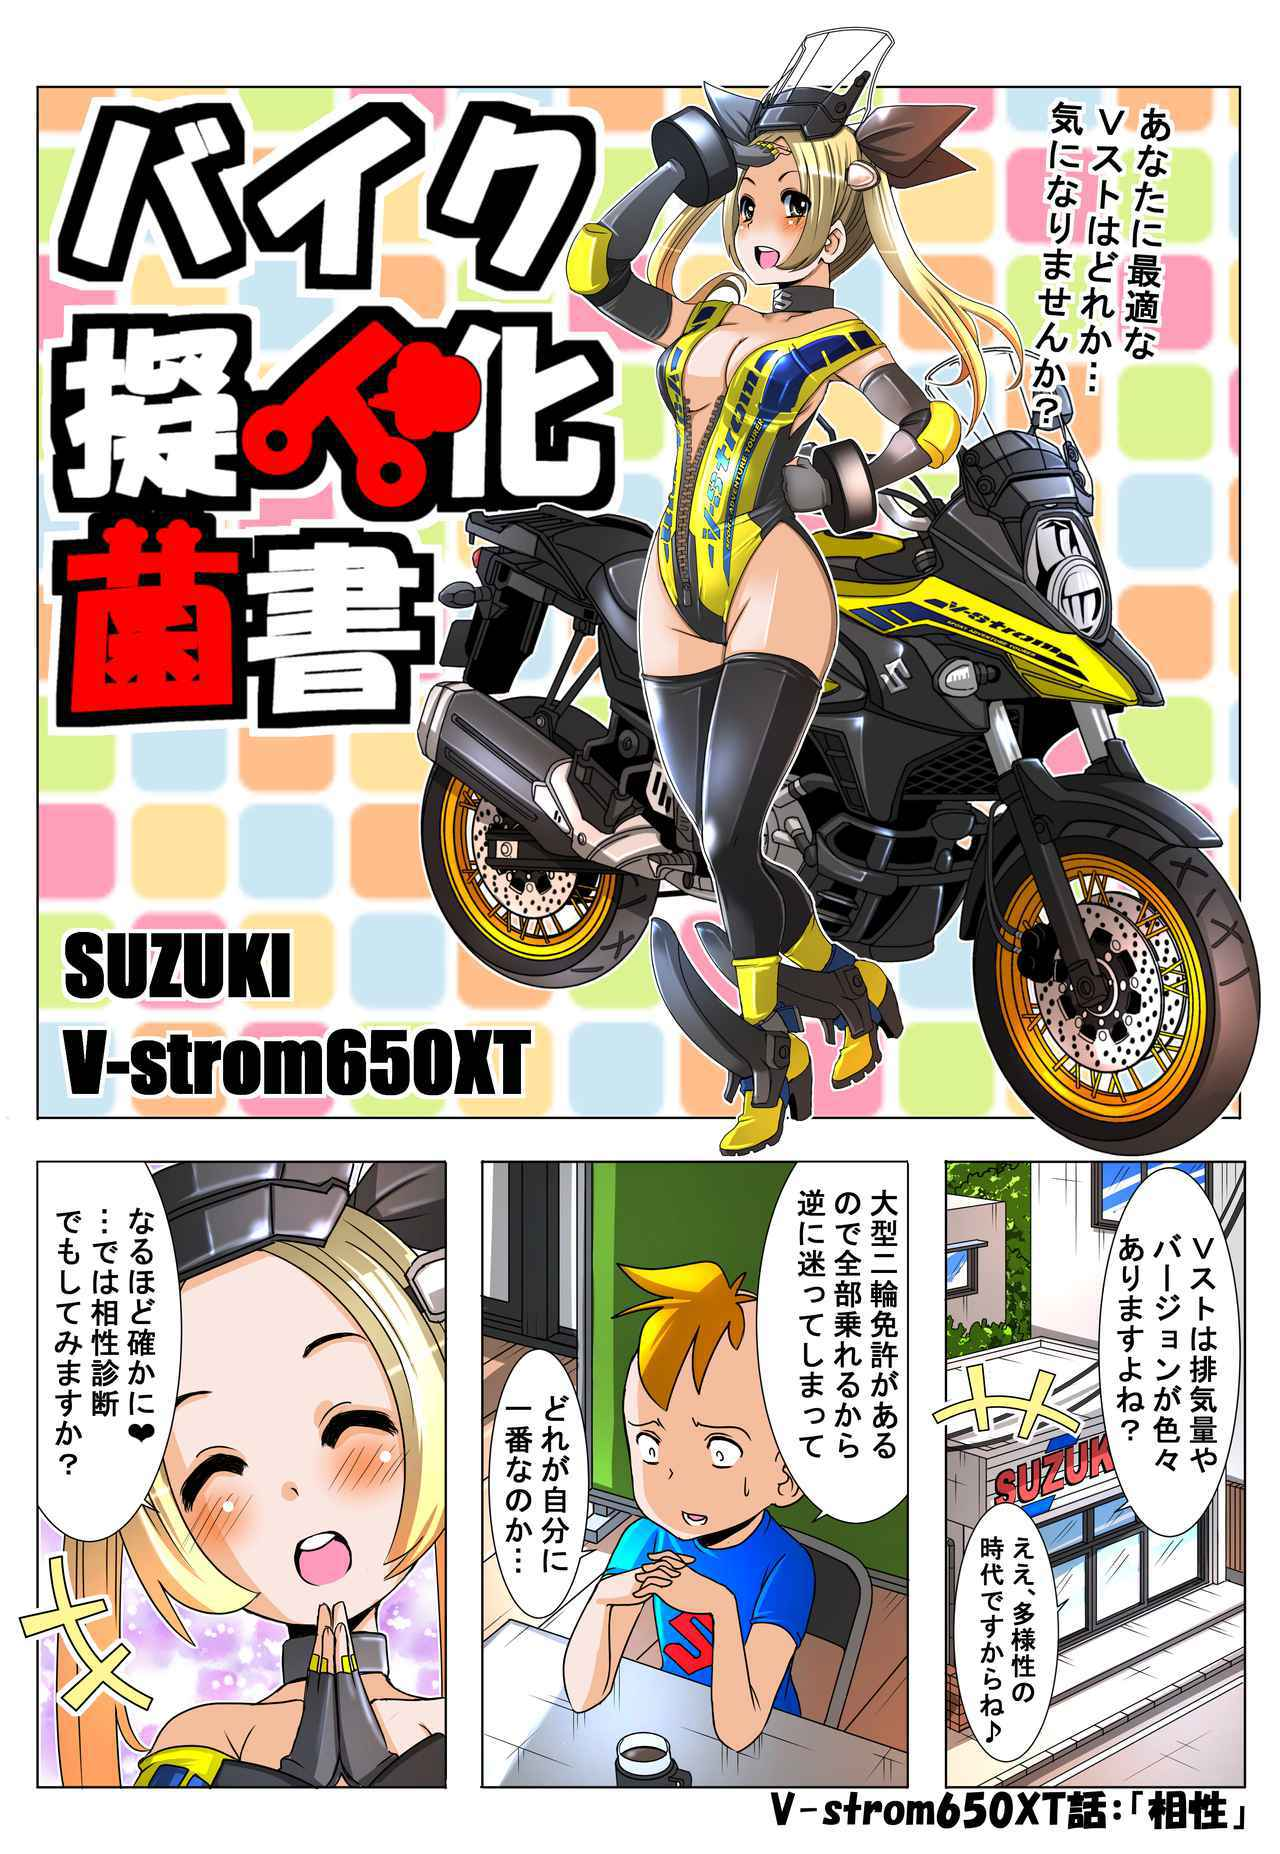 画像1: 『バイク擬人化菌書』V-strom650XT 話「相性」 作:鈴木秀吉